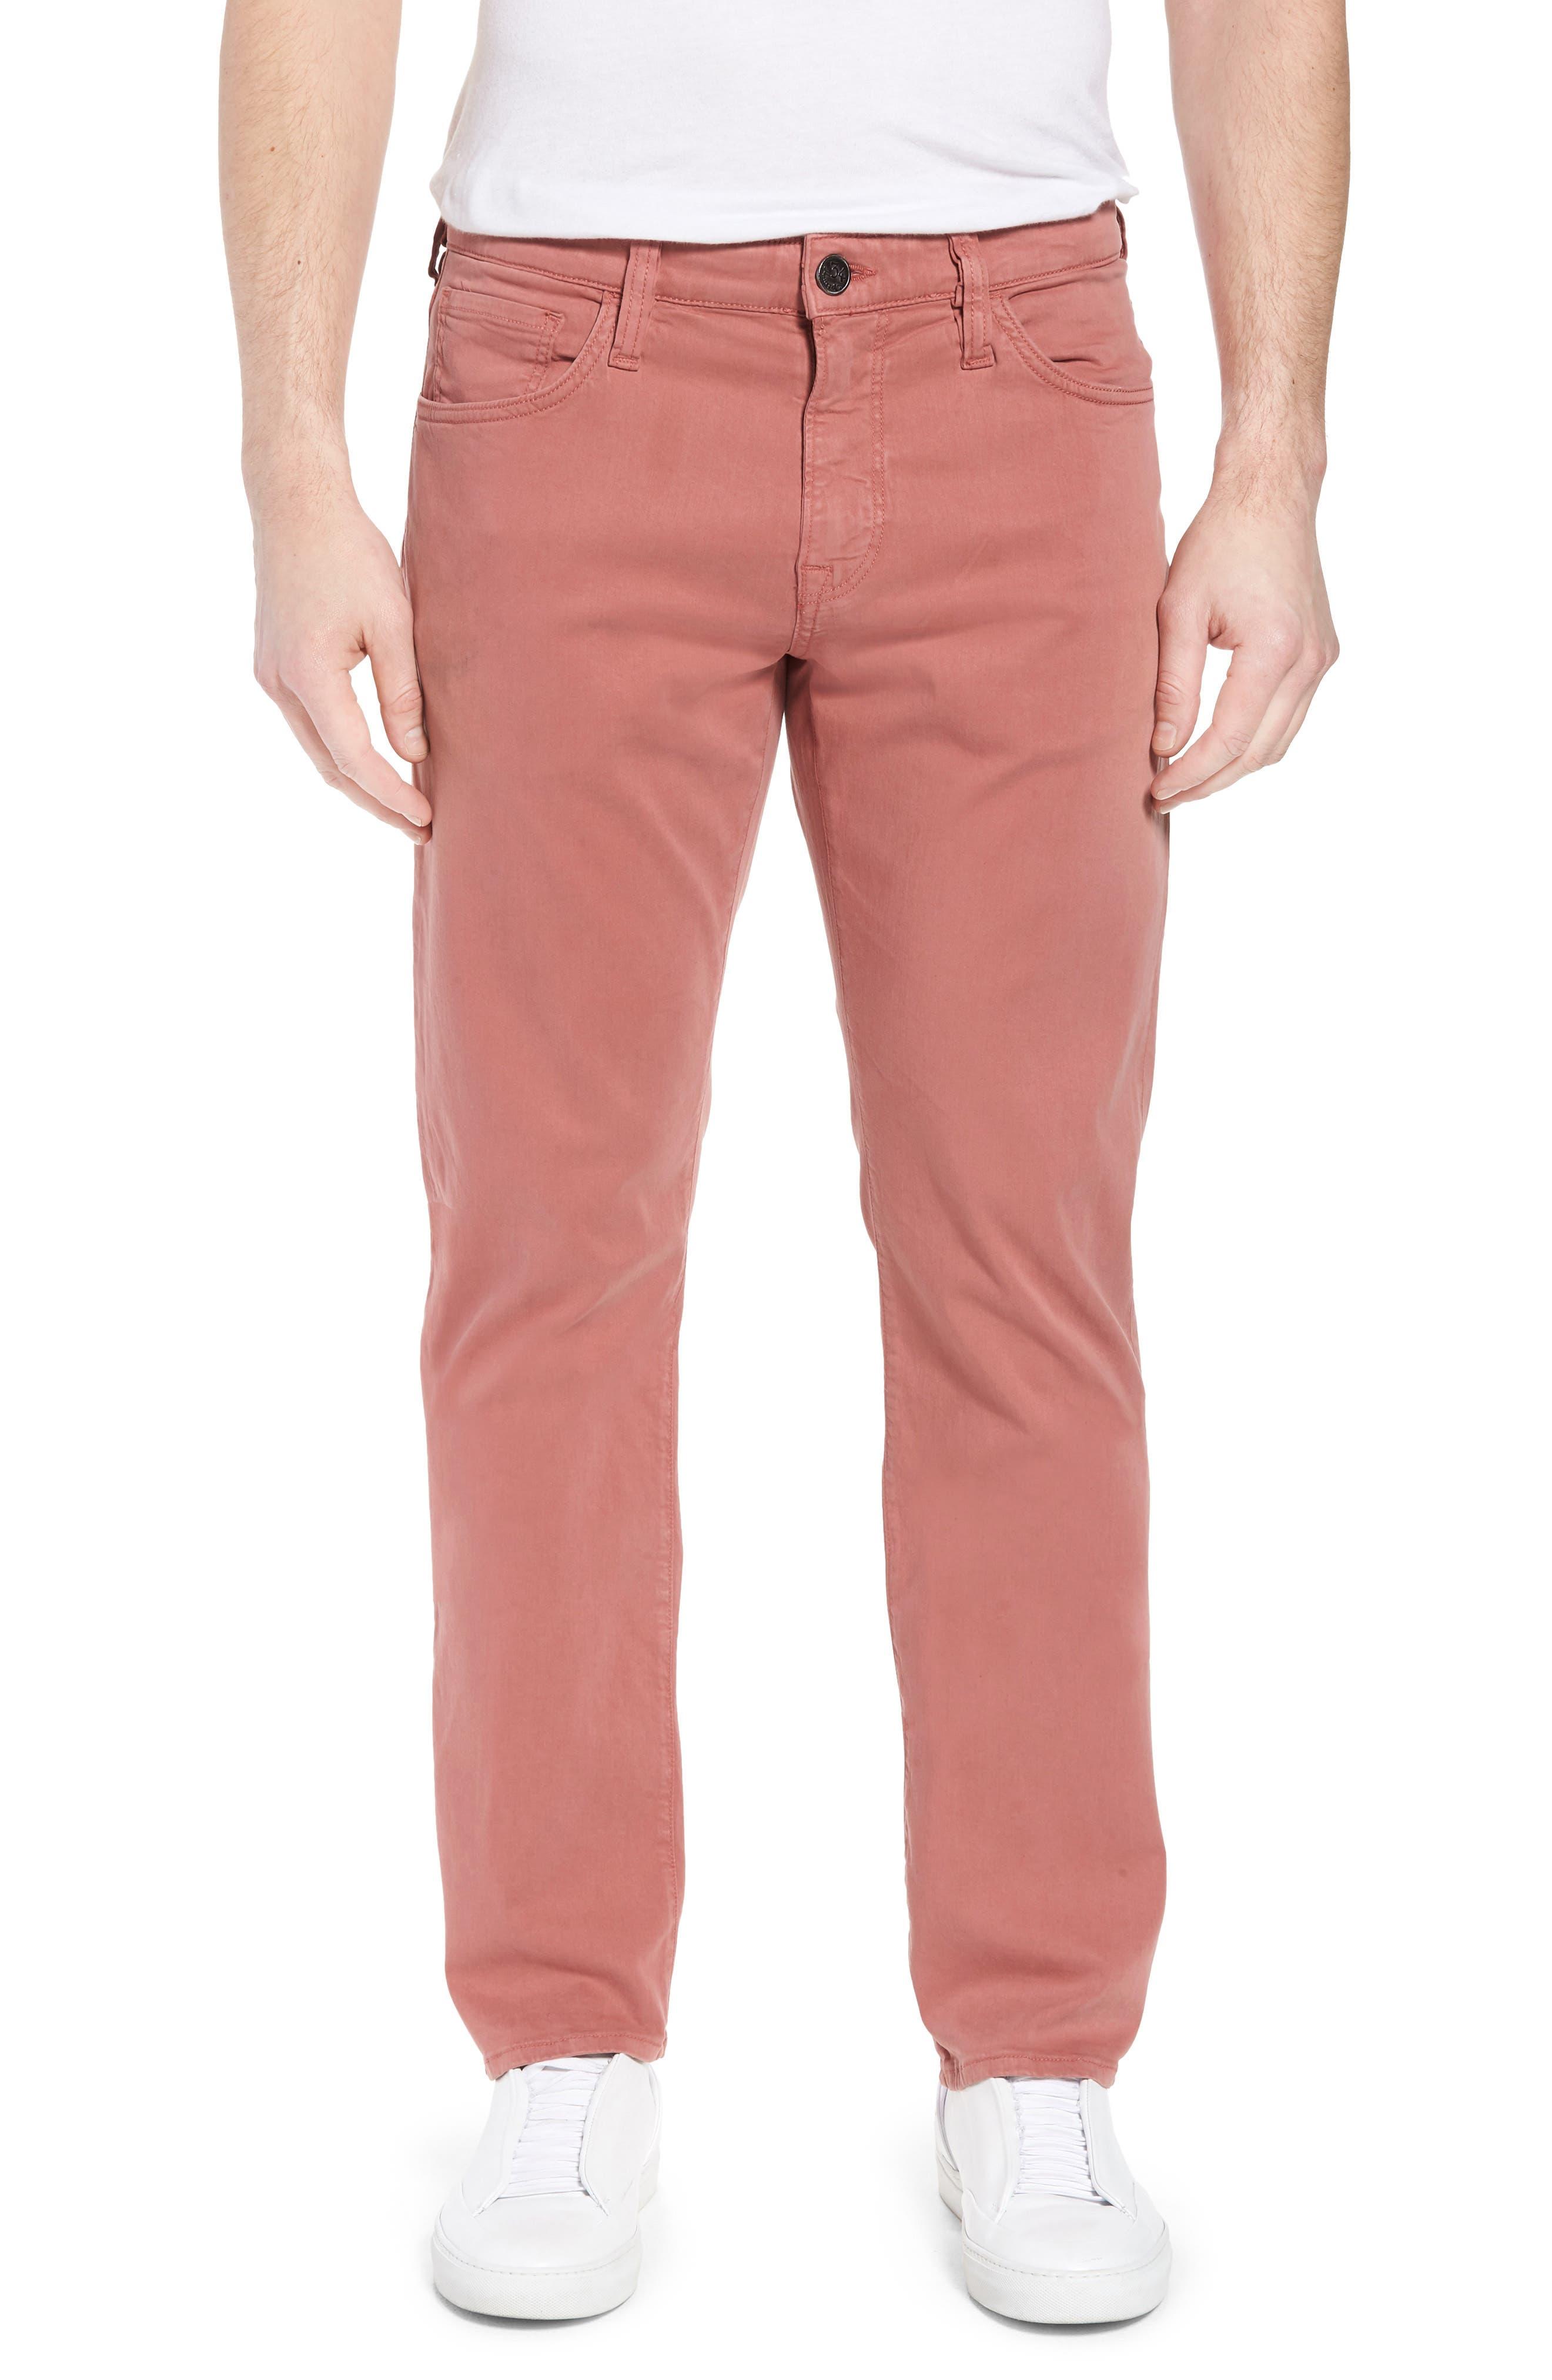 Courage Straight Leg Twill Pants, Main, color, BRICK TWILL